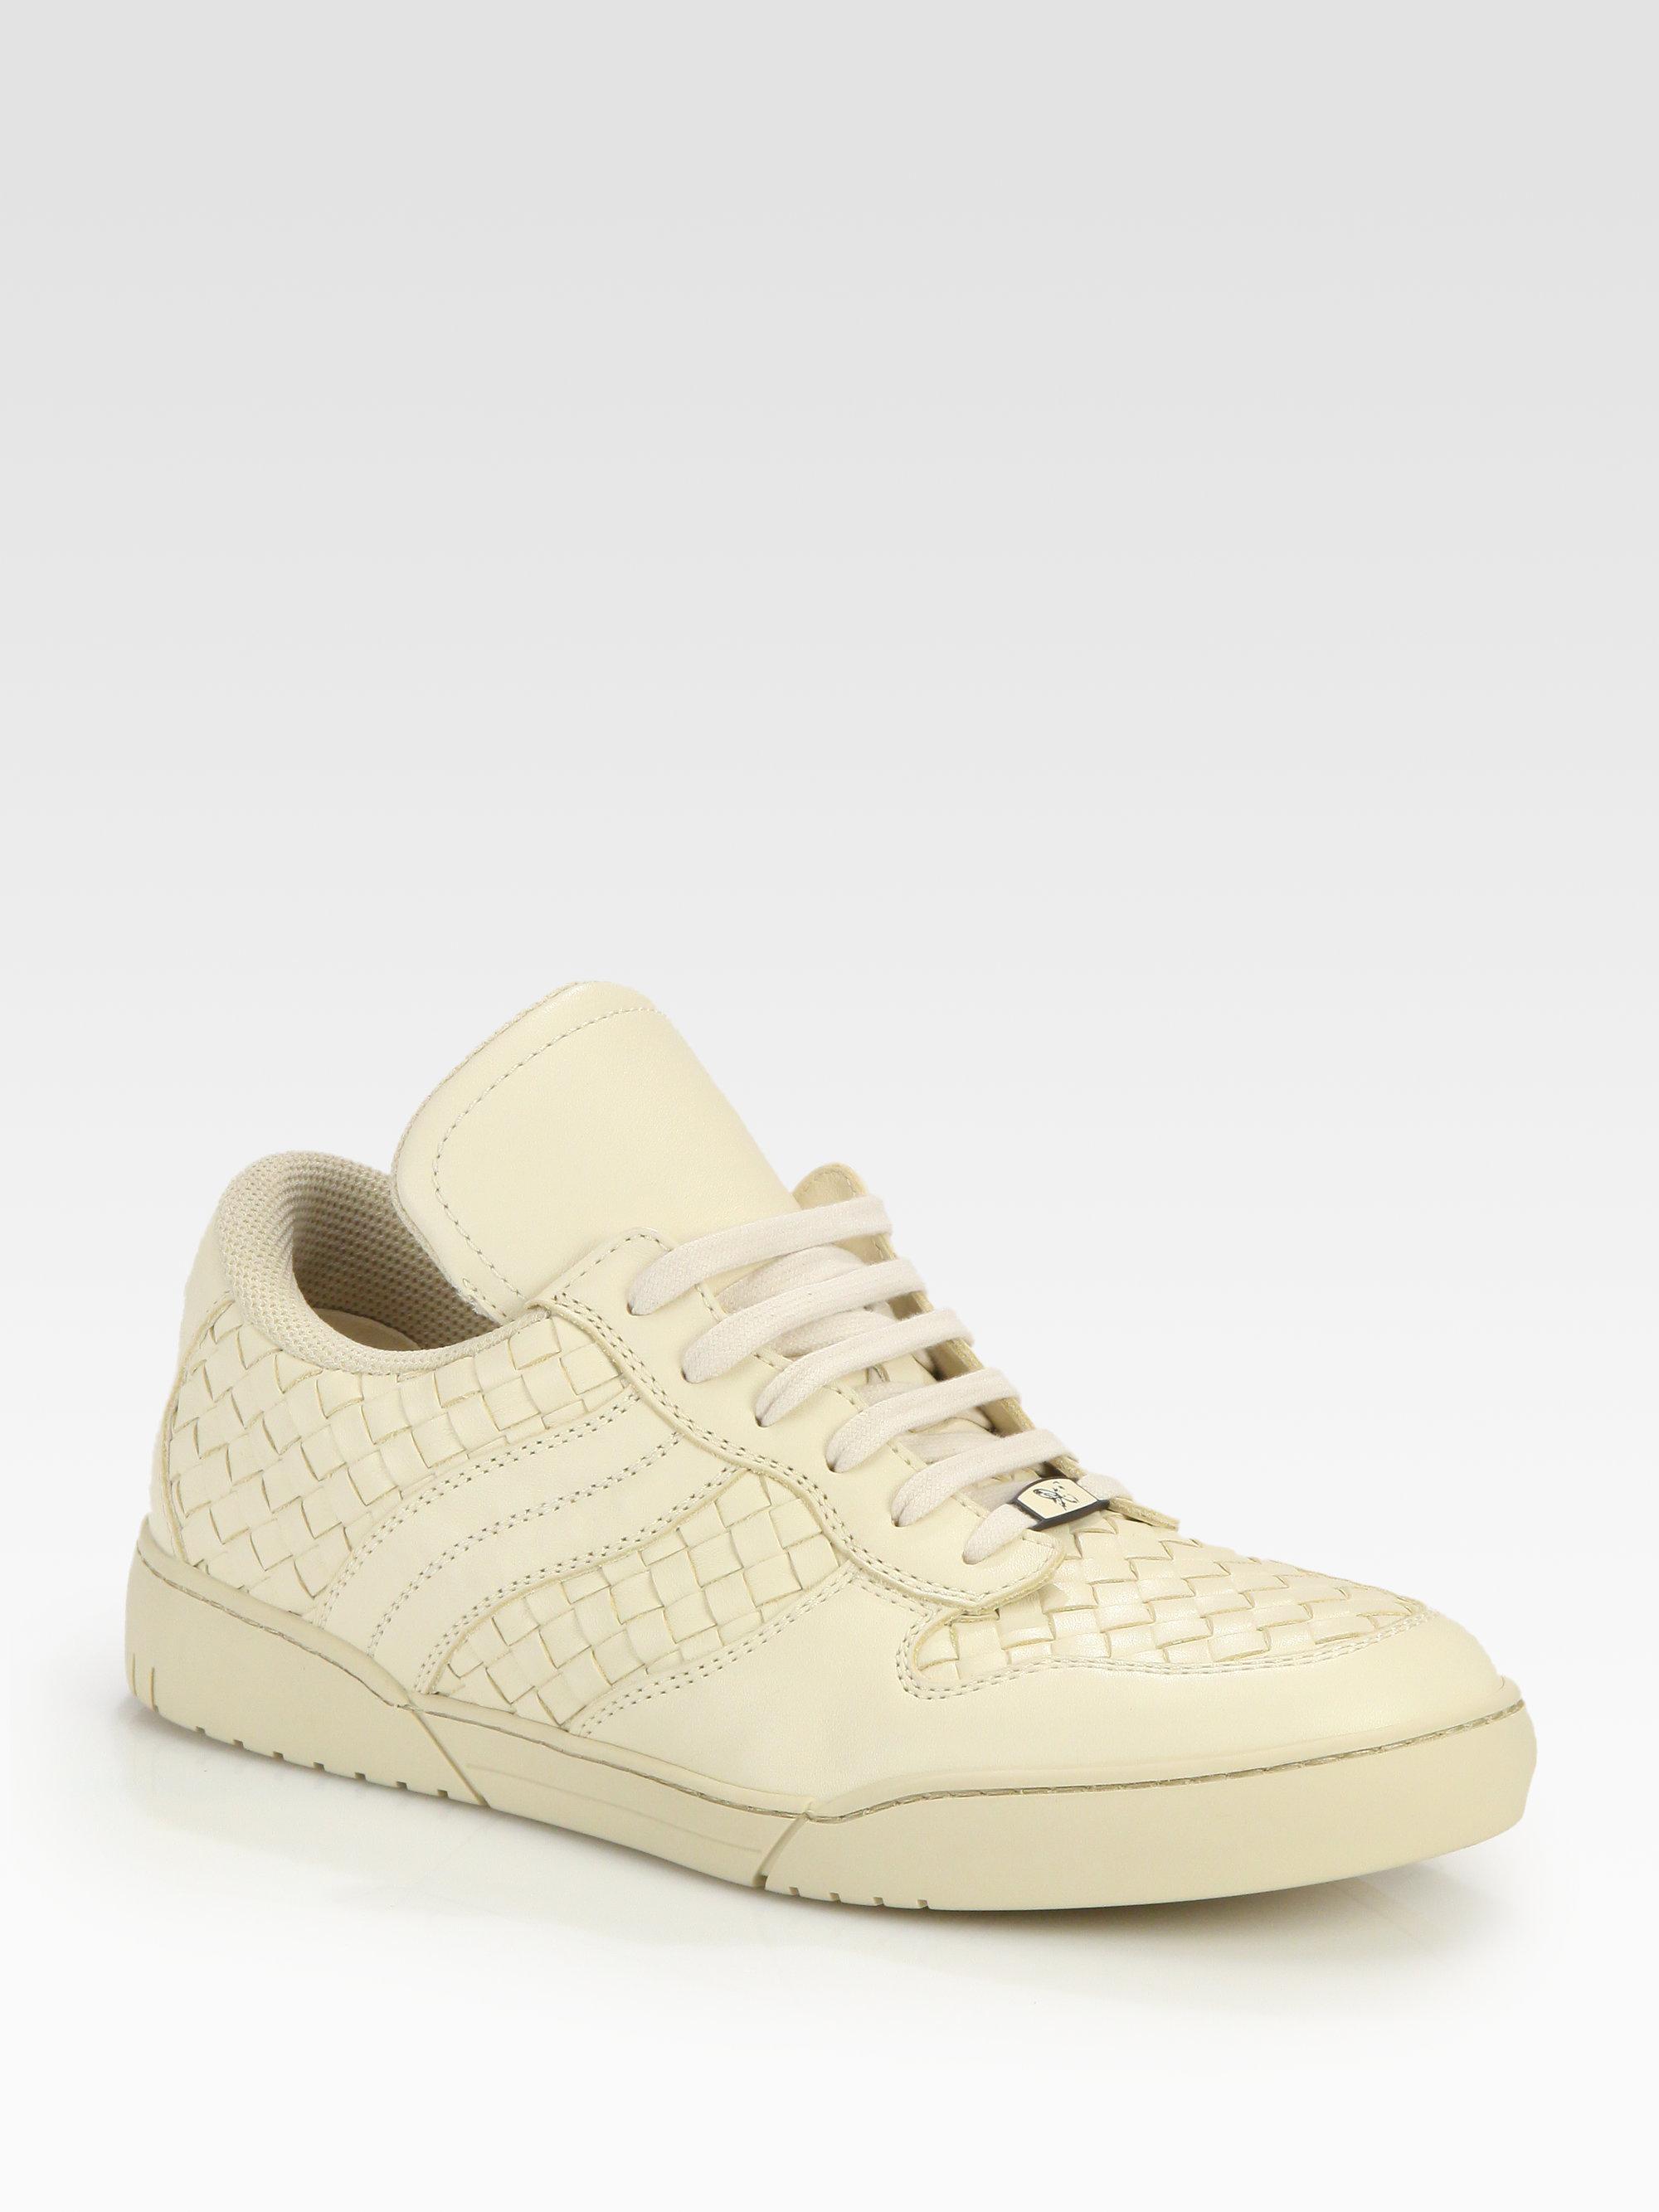 Bottega VenetaSpeedster Leather Sneakers jM0wxu